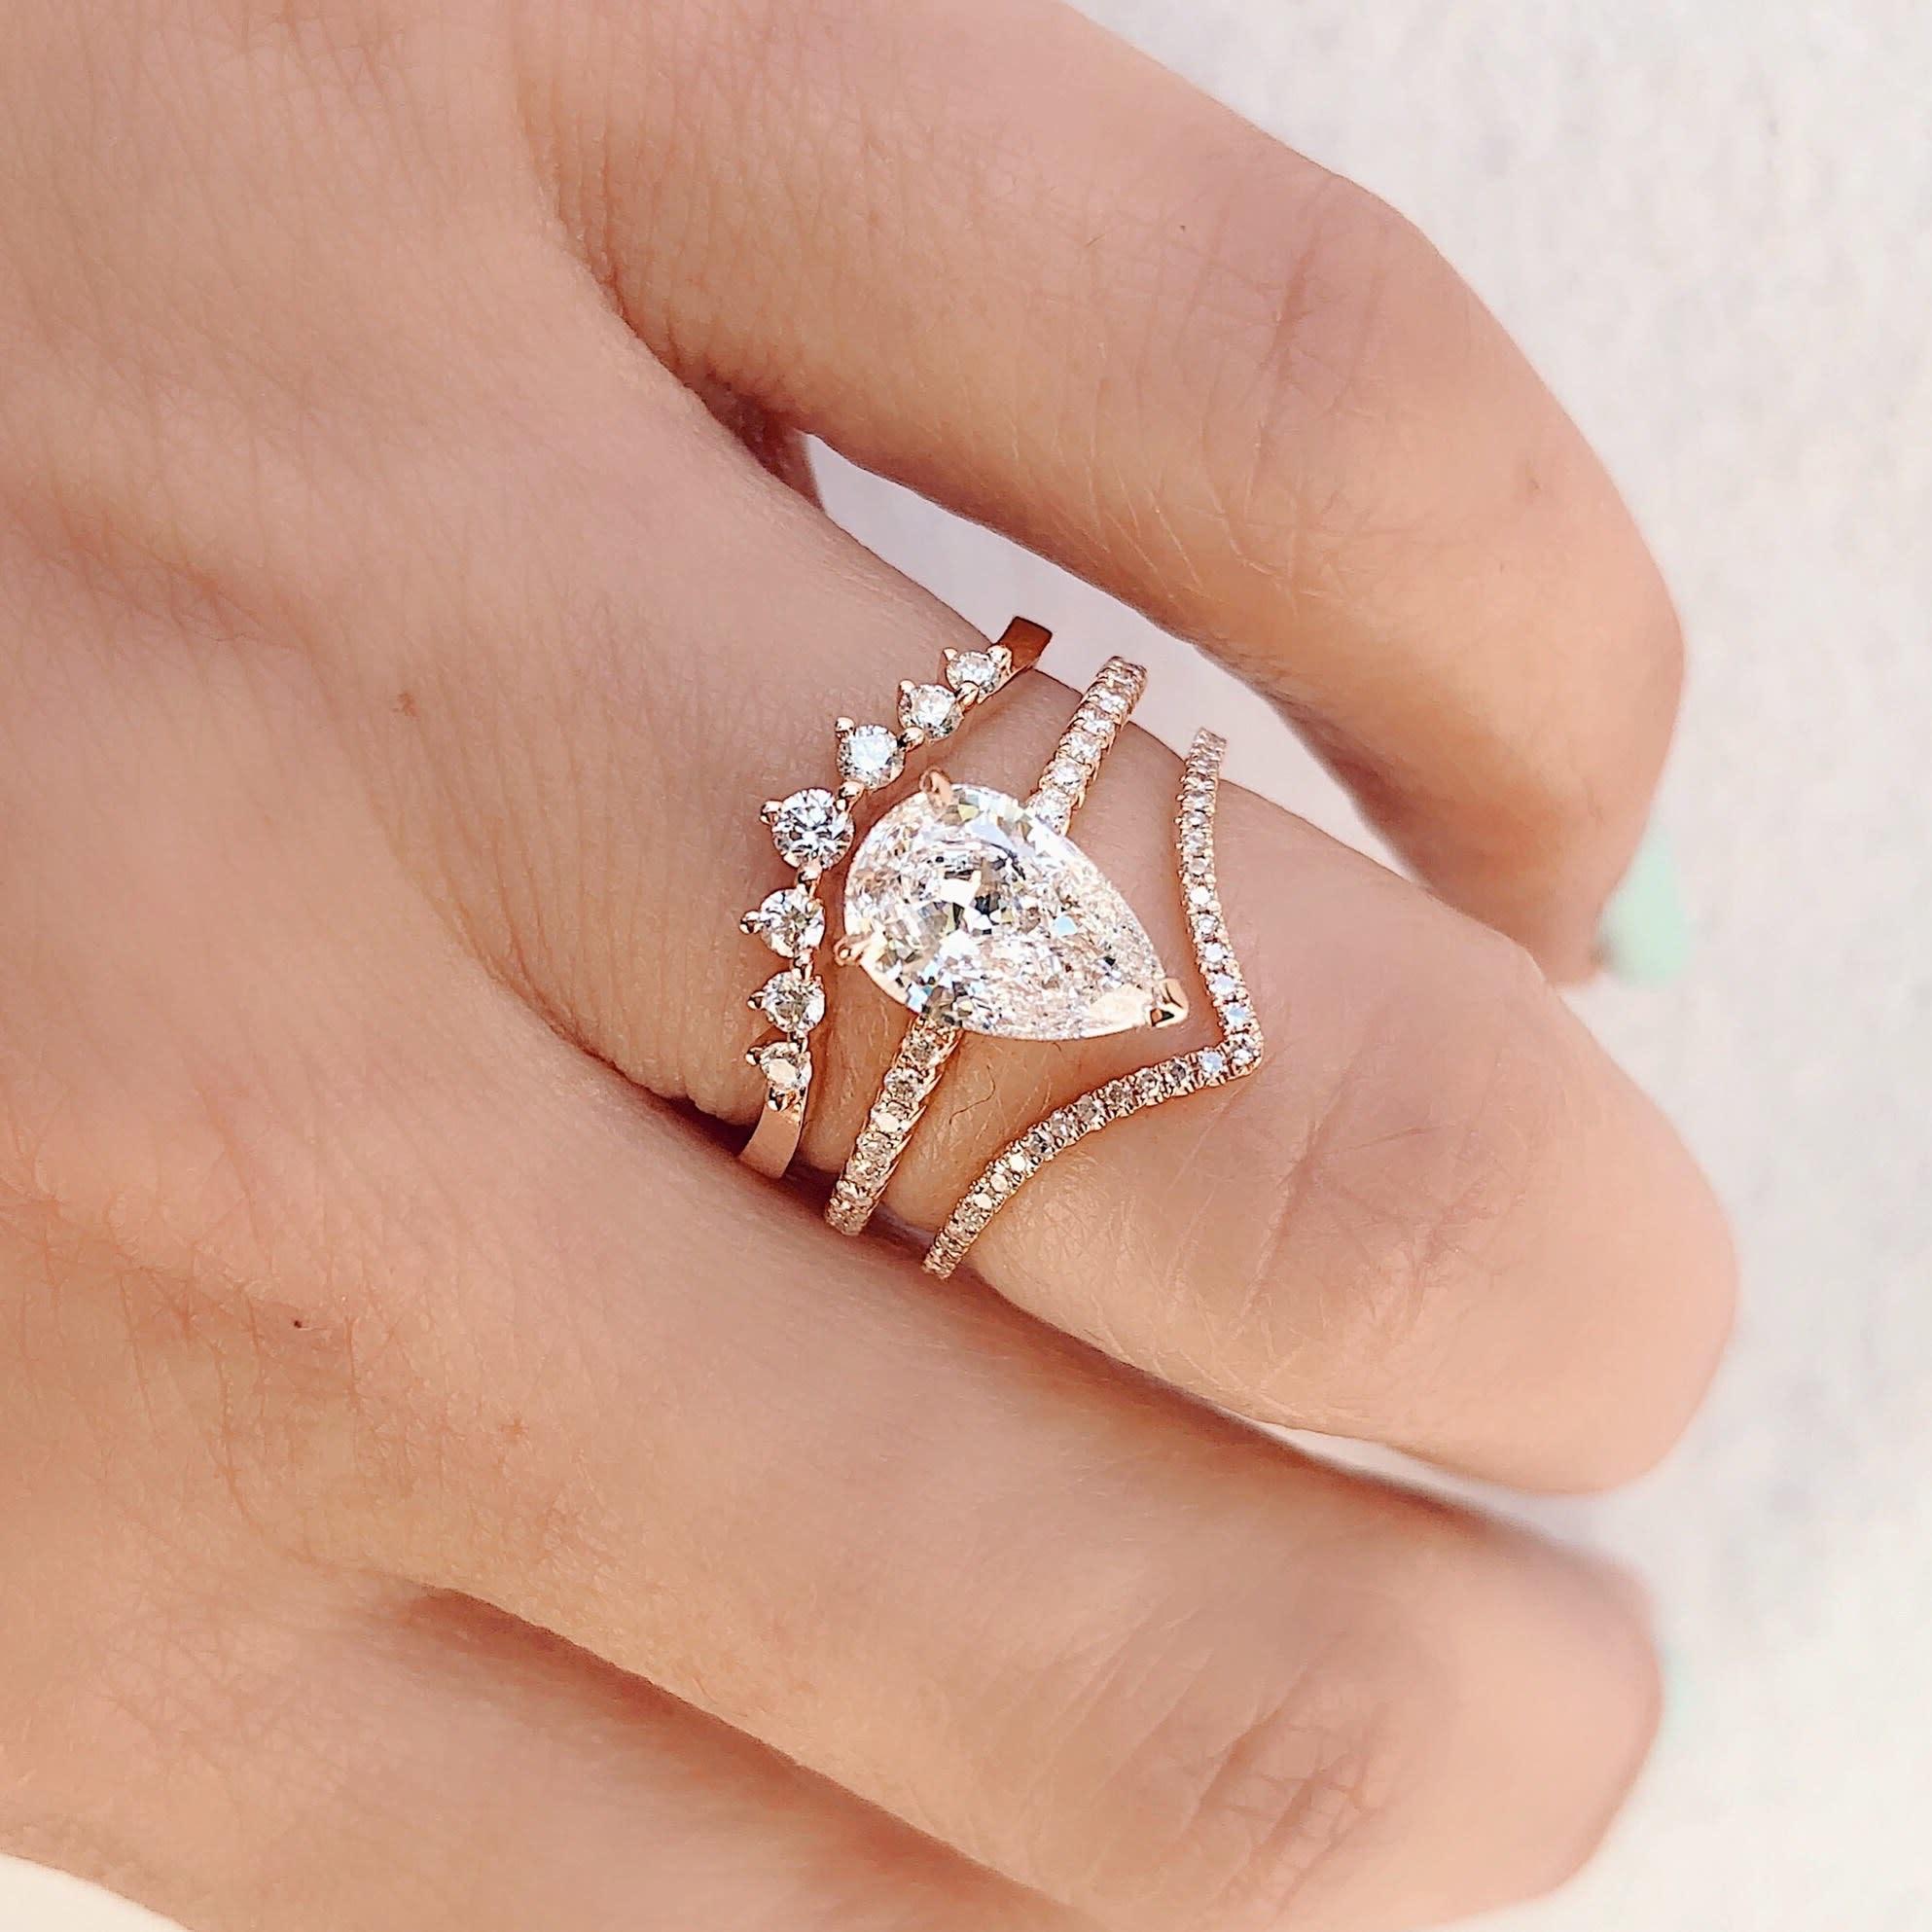 V Shaped Pave Diamond White Gold Ring